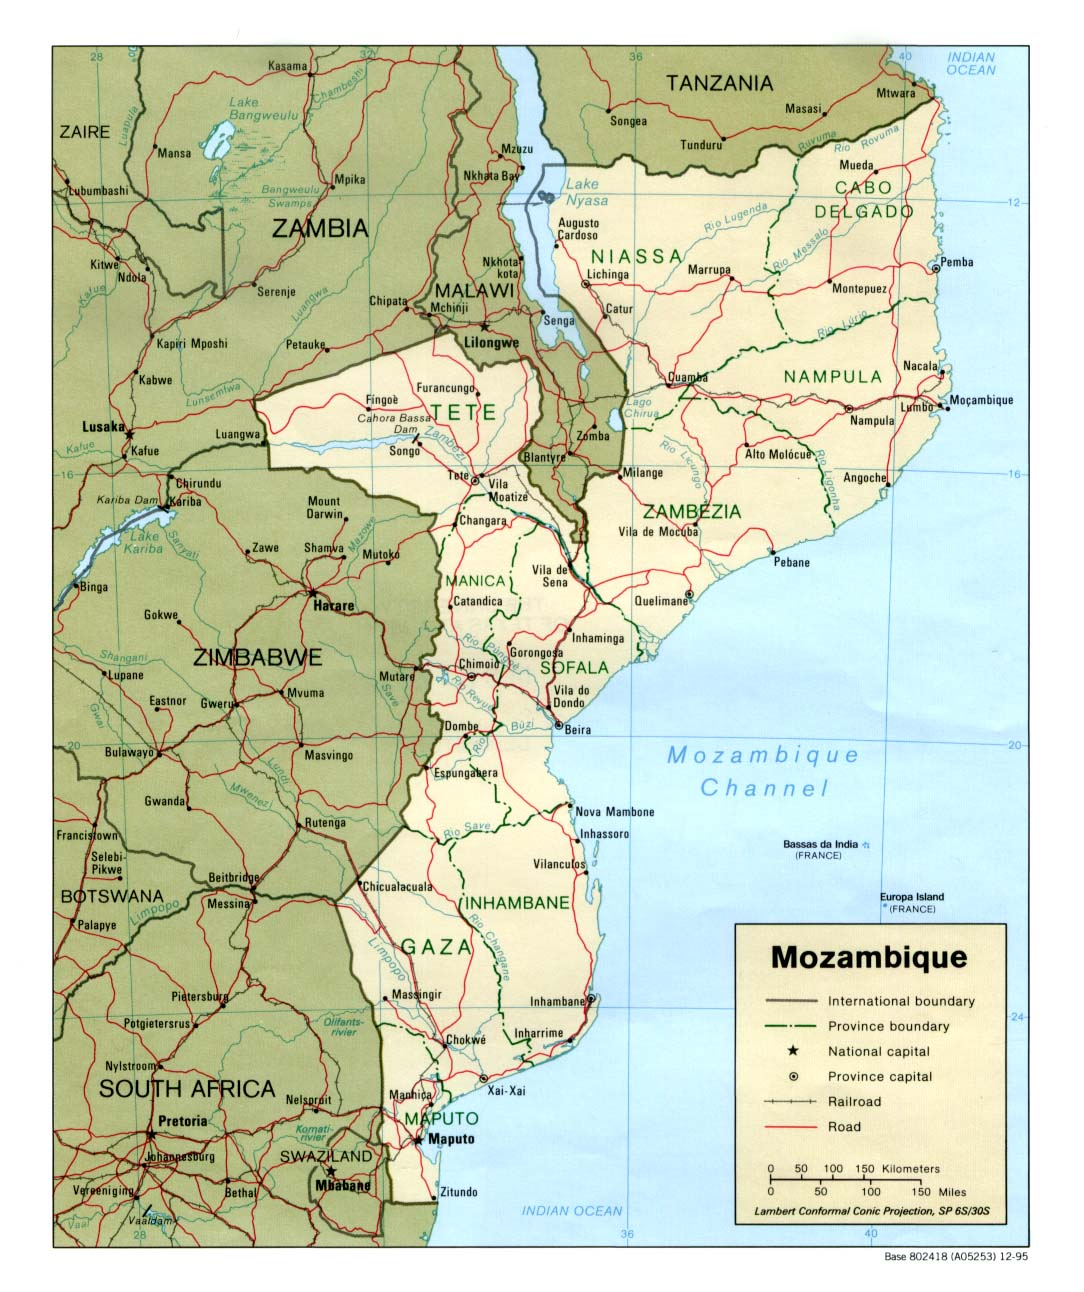 Download free mozambique maps gumiabroncs Images